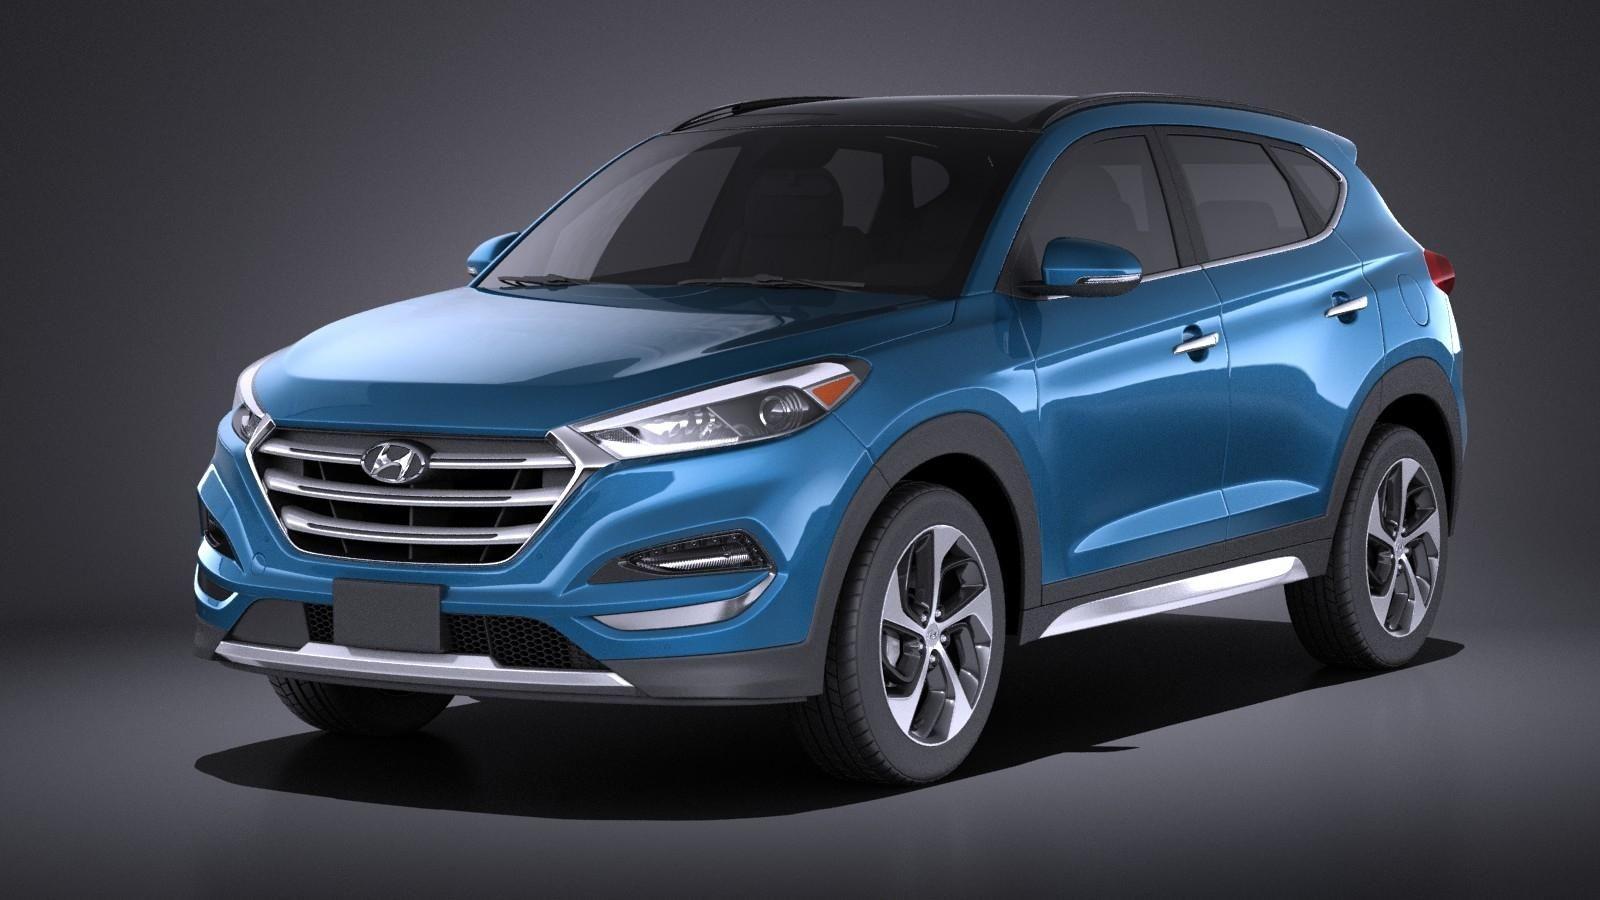 Hyundai Tucson 2017 VRAY 3D Model AD ,TucsonHyundai